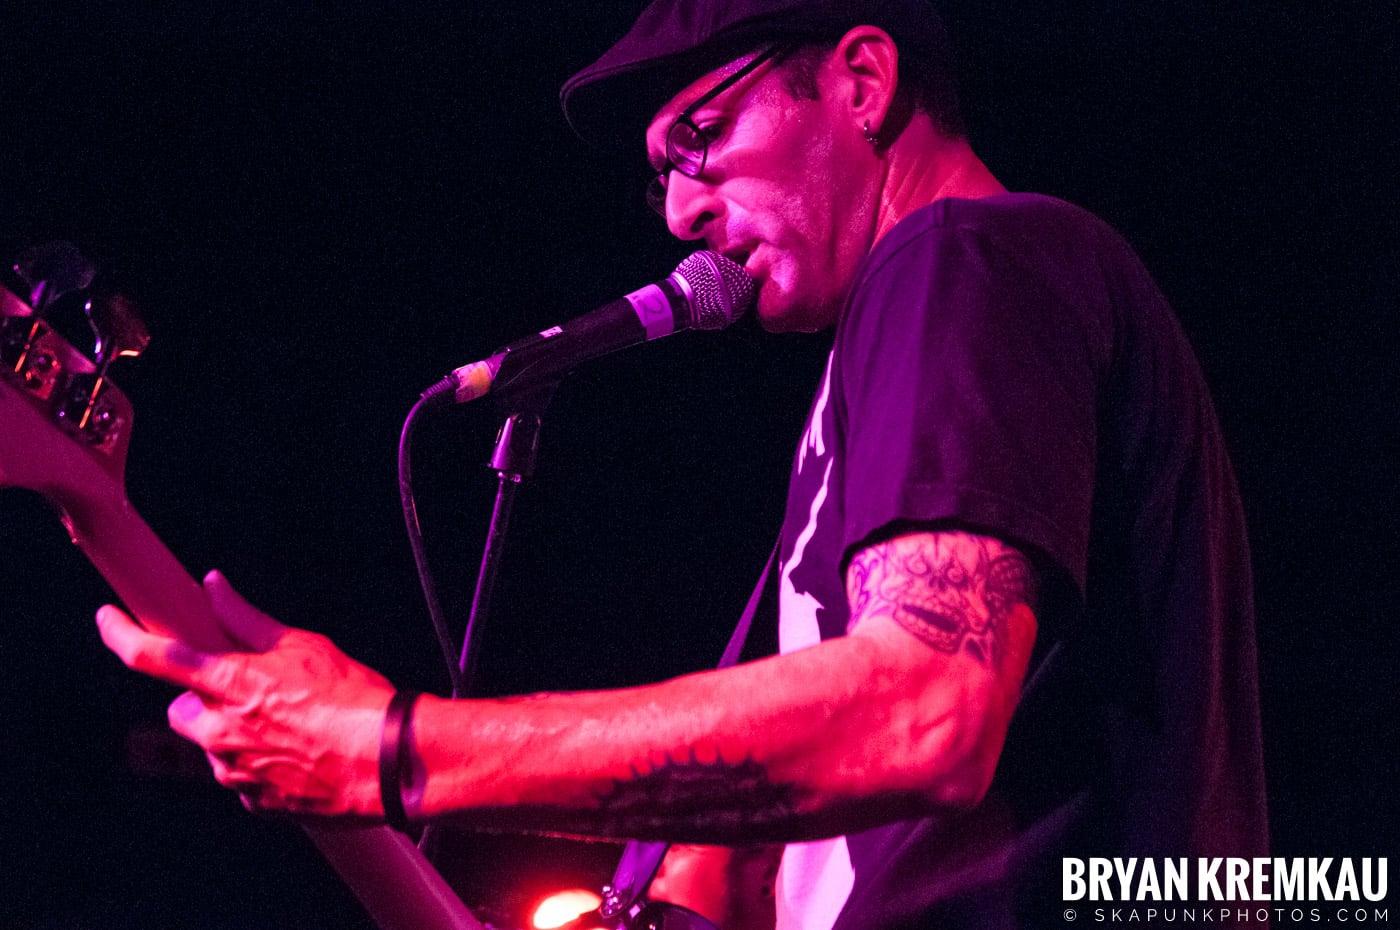 Voodoo Glow Skulls (Ska is Dead Tour) @ Starland Ballroom, Sayreville, NJ - 11.15.09 (2)